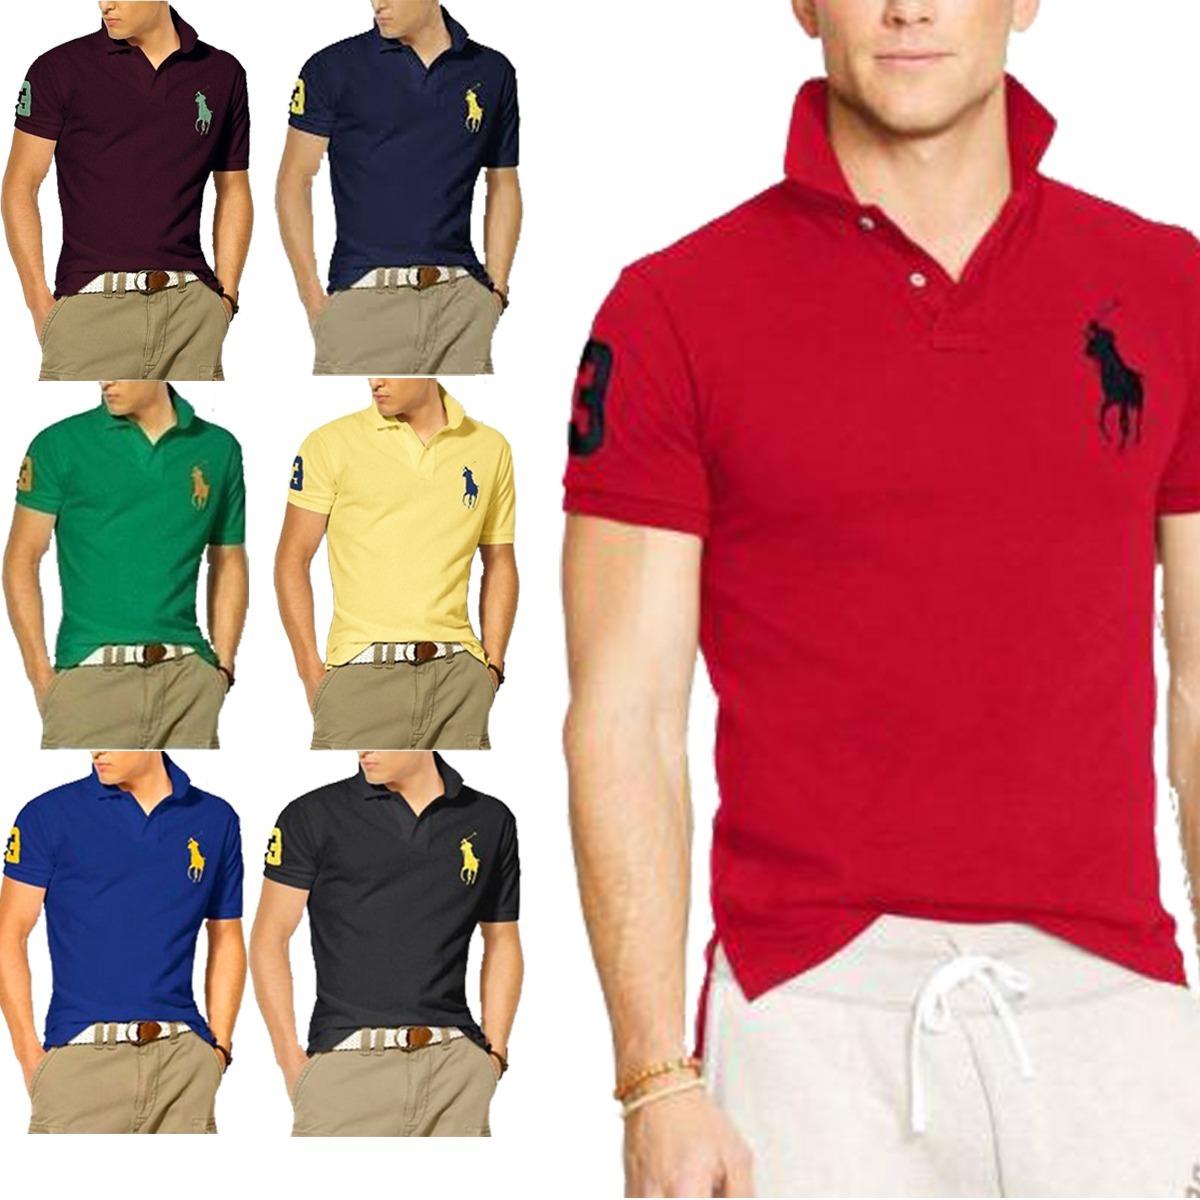 Kit 06 Camisas Camisetas Gola Polo Masculina Atacado Revenda - R ... 2645294723ce0